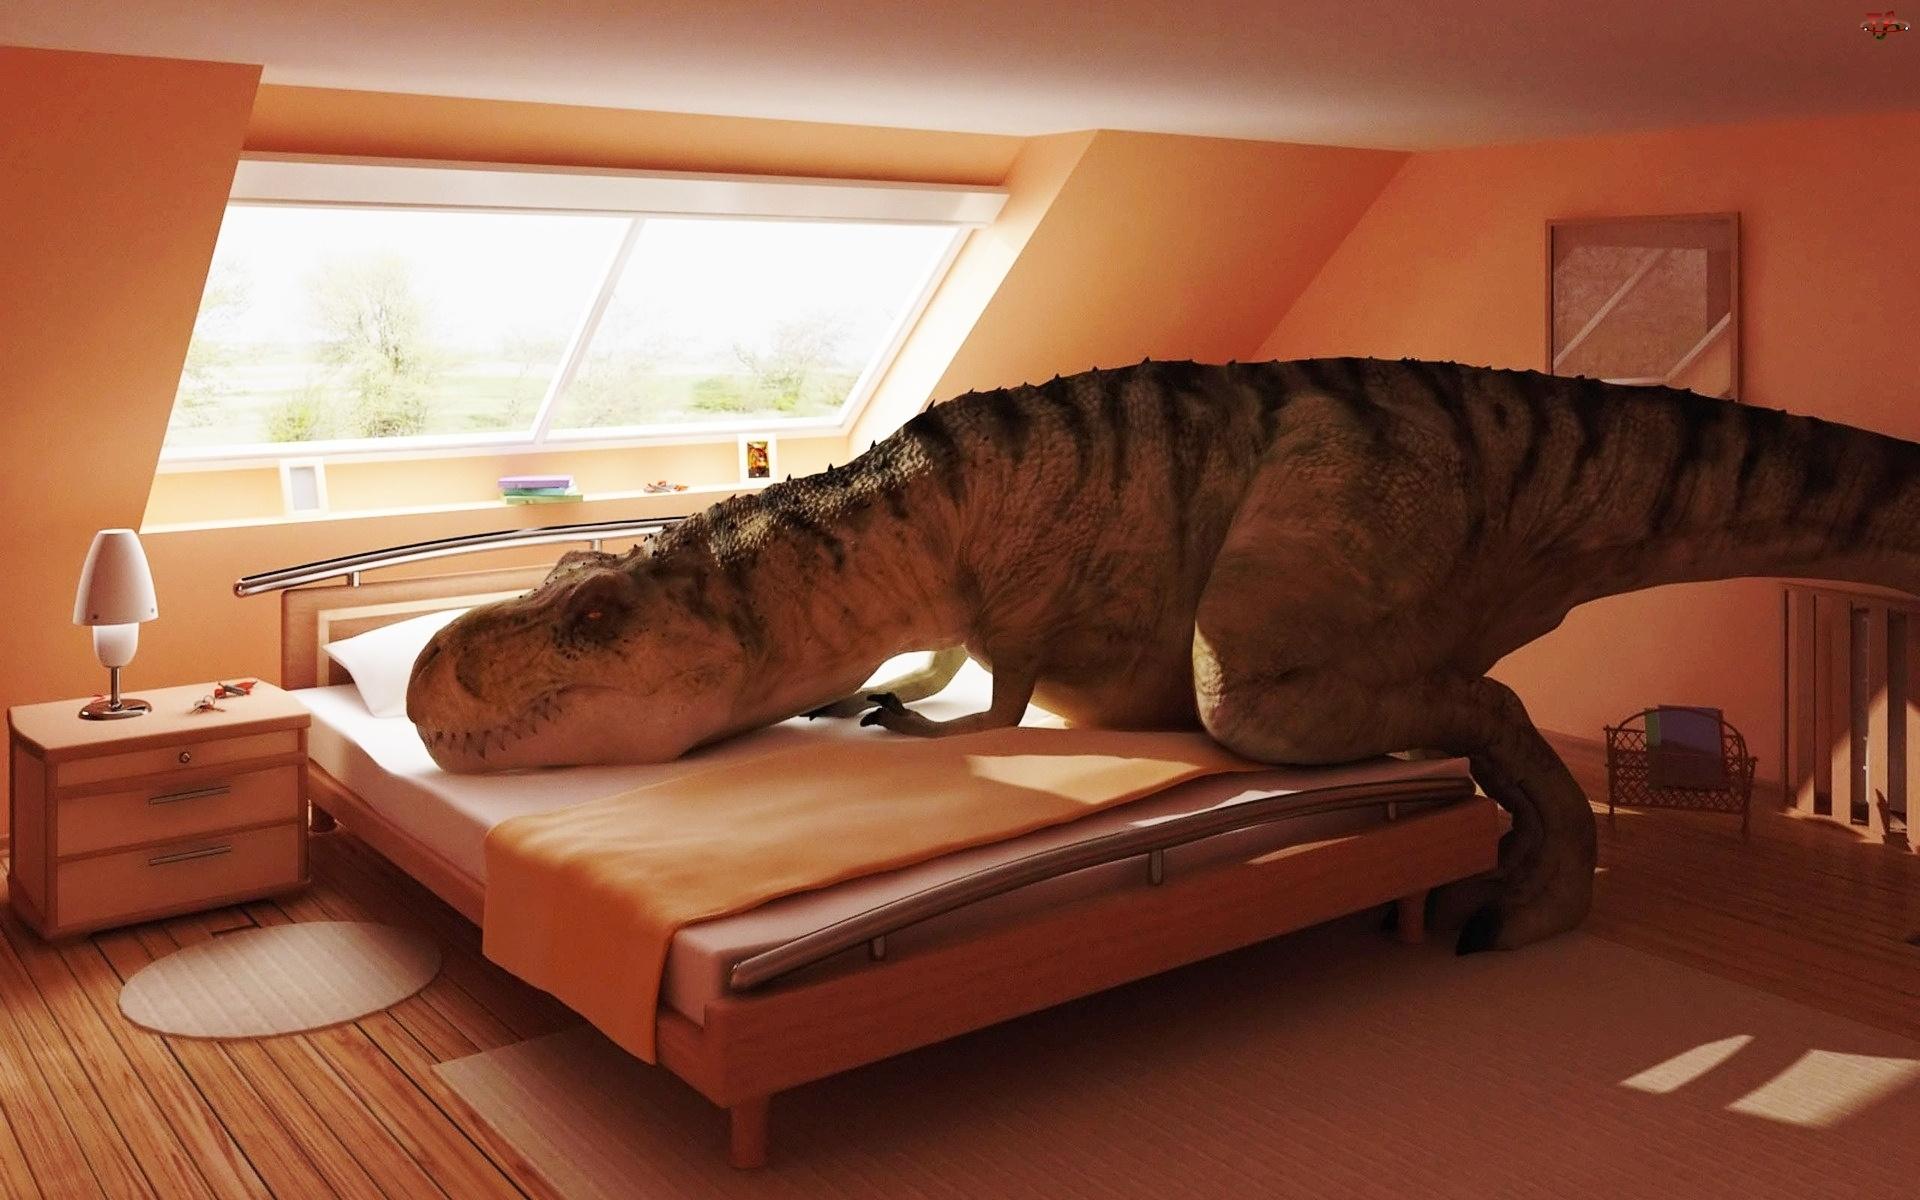 Łóżko, Dinozaur, Poddasze